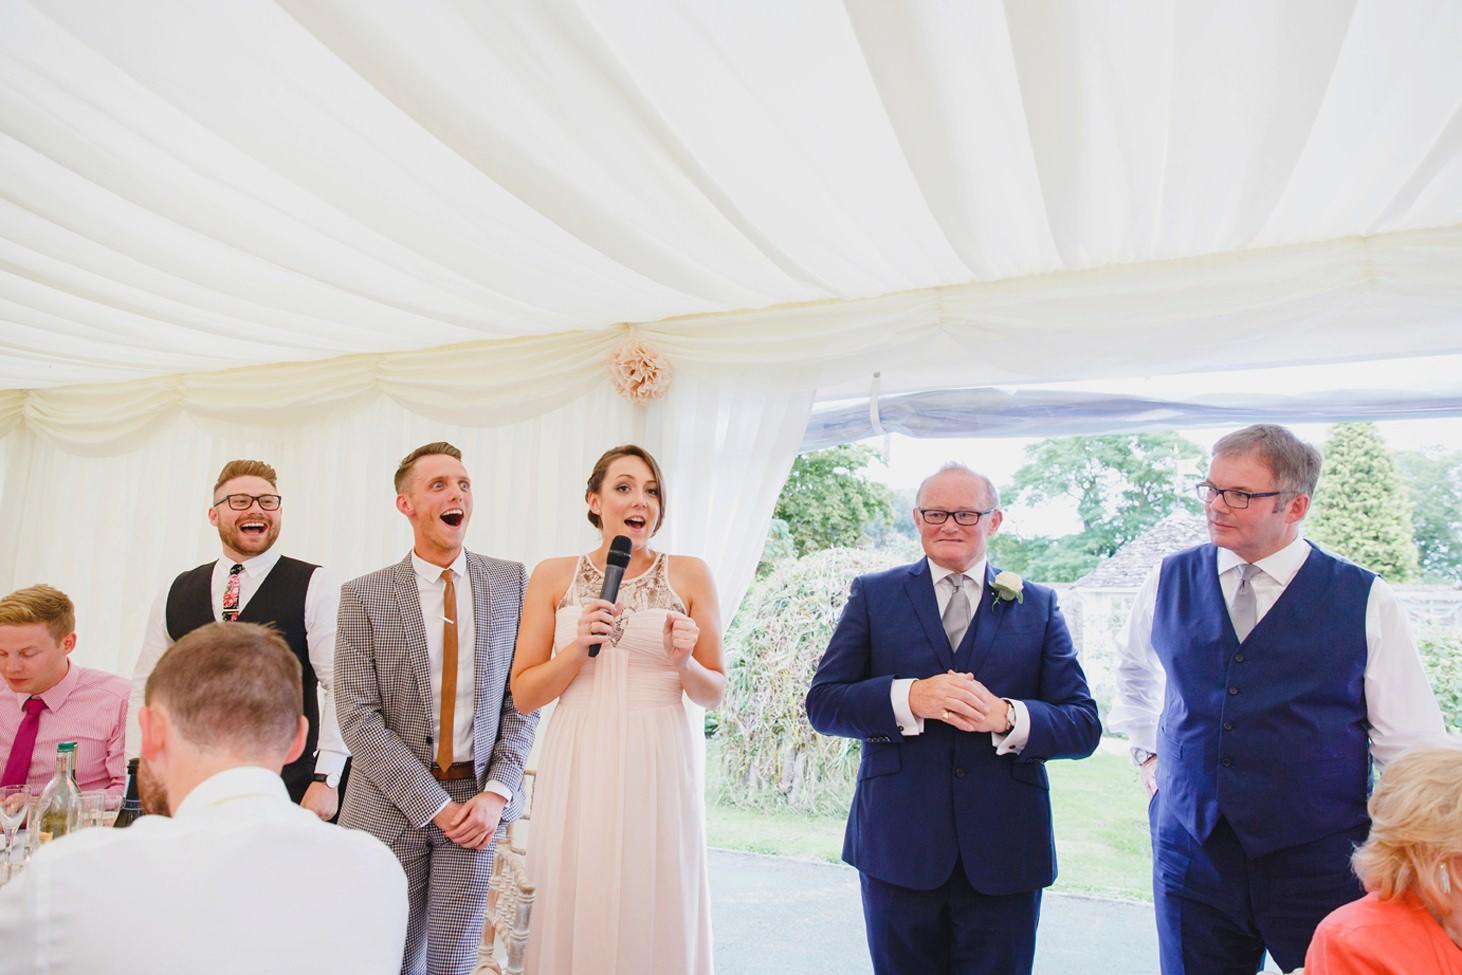 oxfordshire wedding photography bridesmaid speech